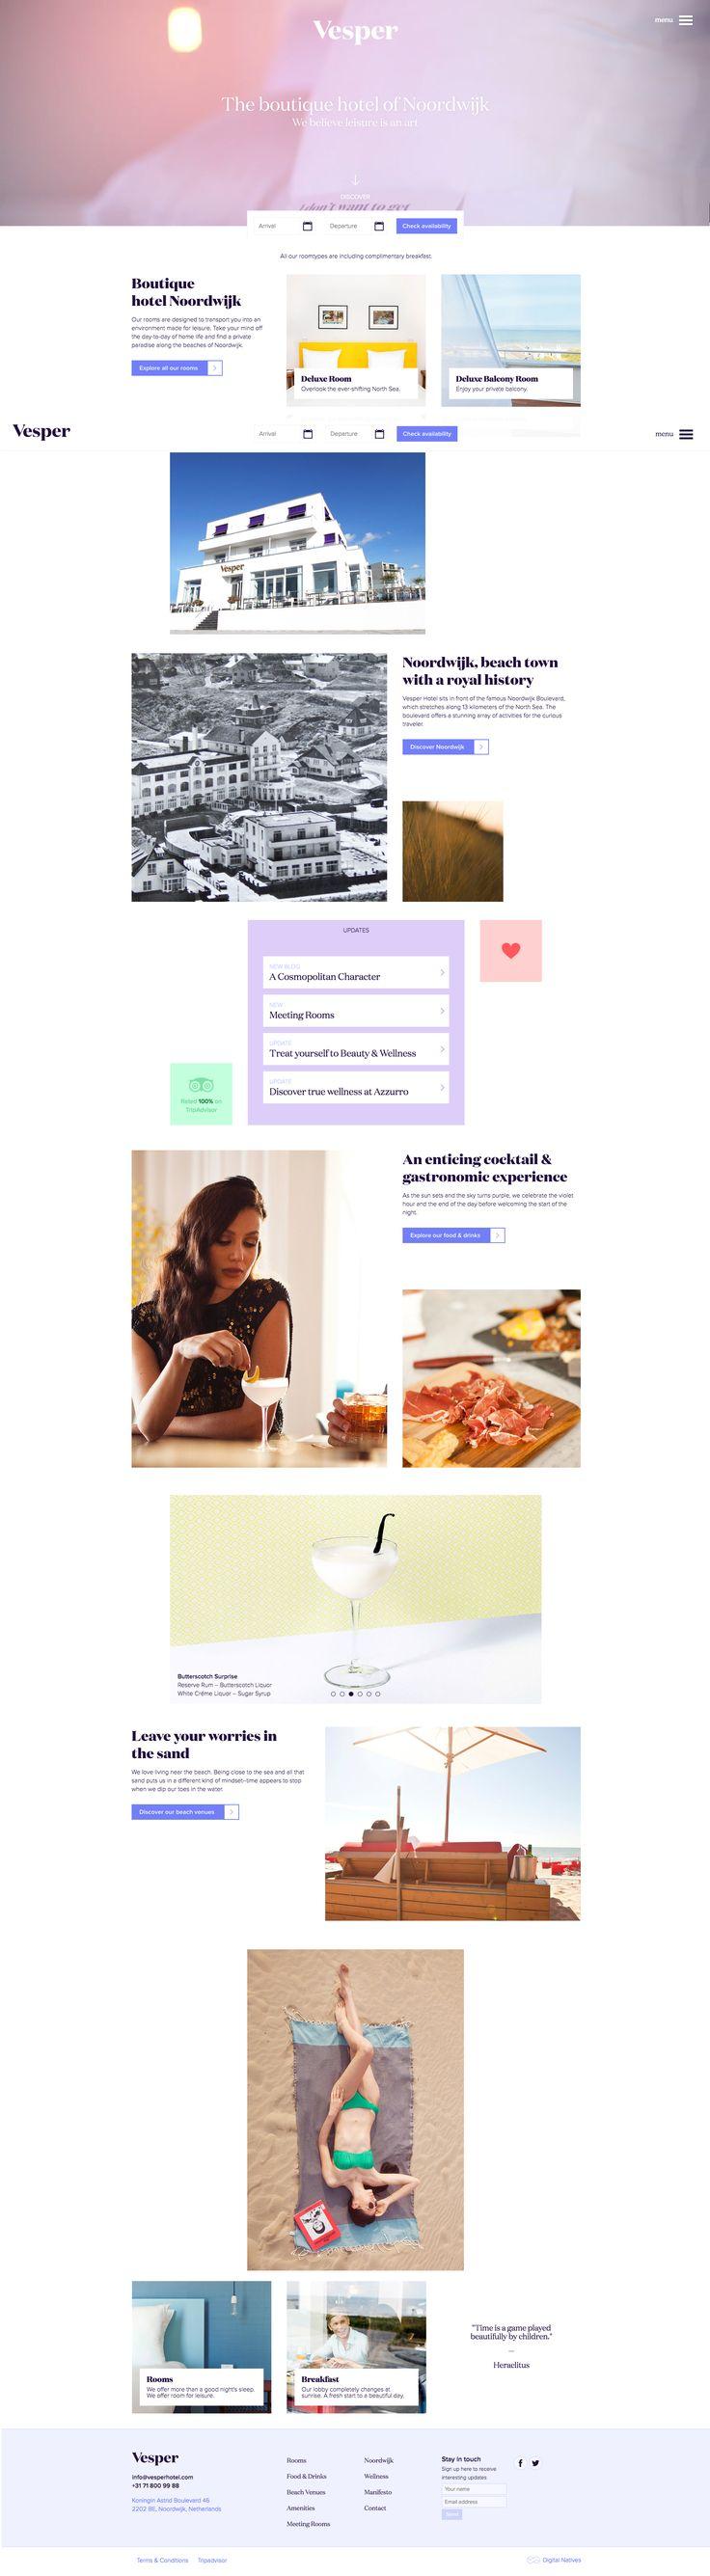 Vesper Hotel Website Design #hotelwebsites #hotelwebsitedesign #websitedesign